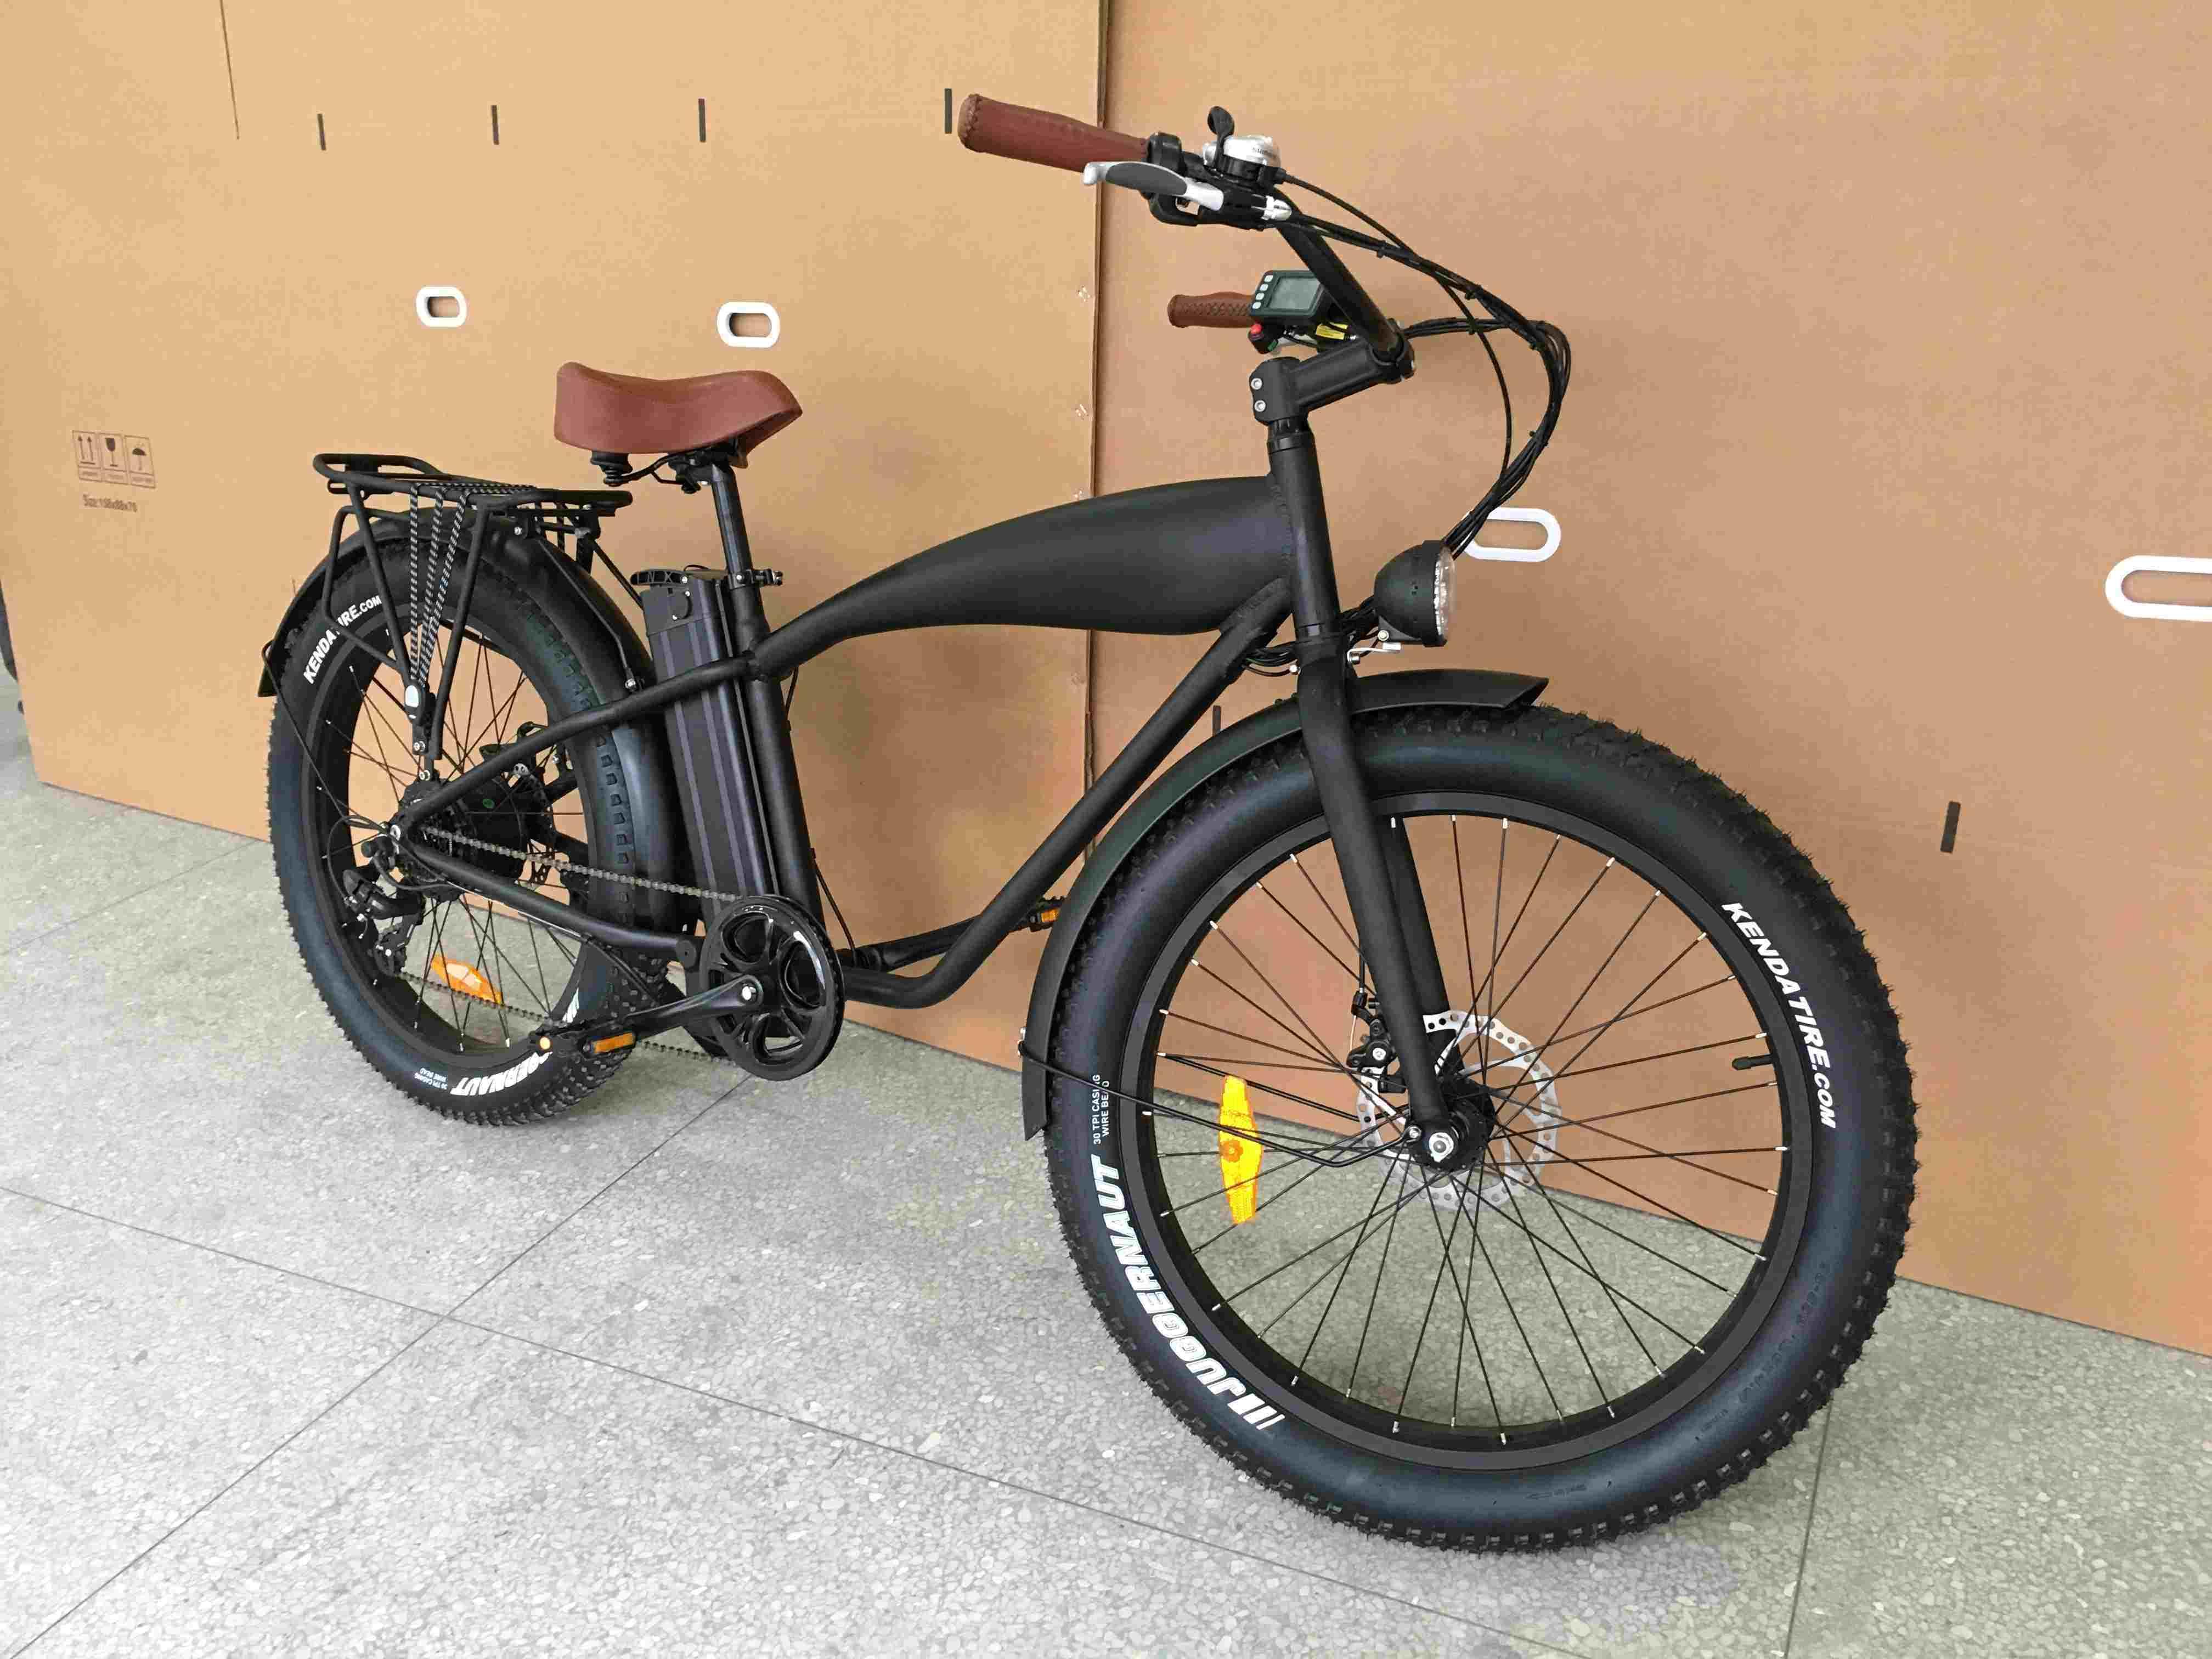 Retro Fat Tire Electric Bicycle with Rear 8fun Motor